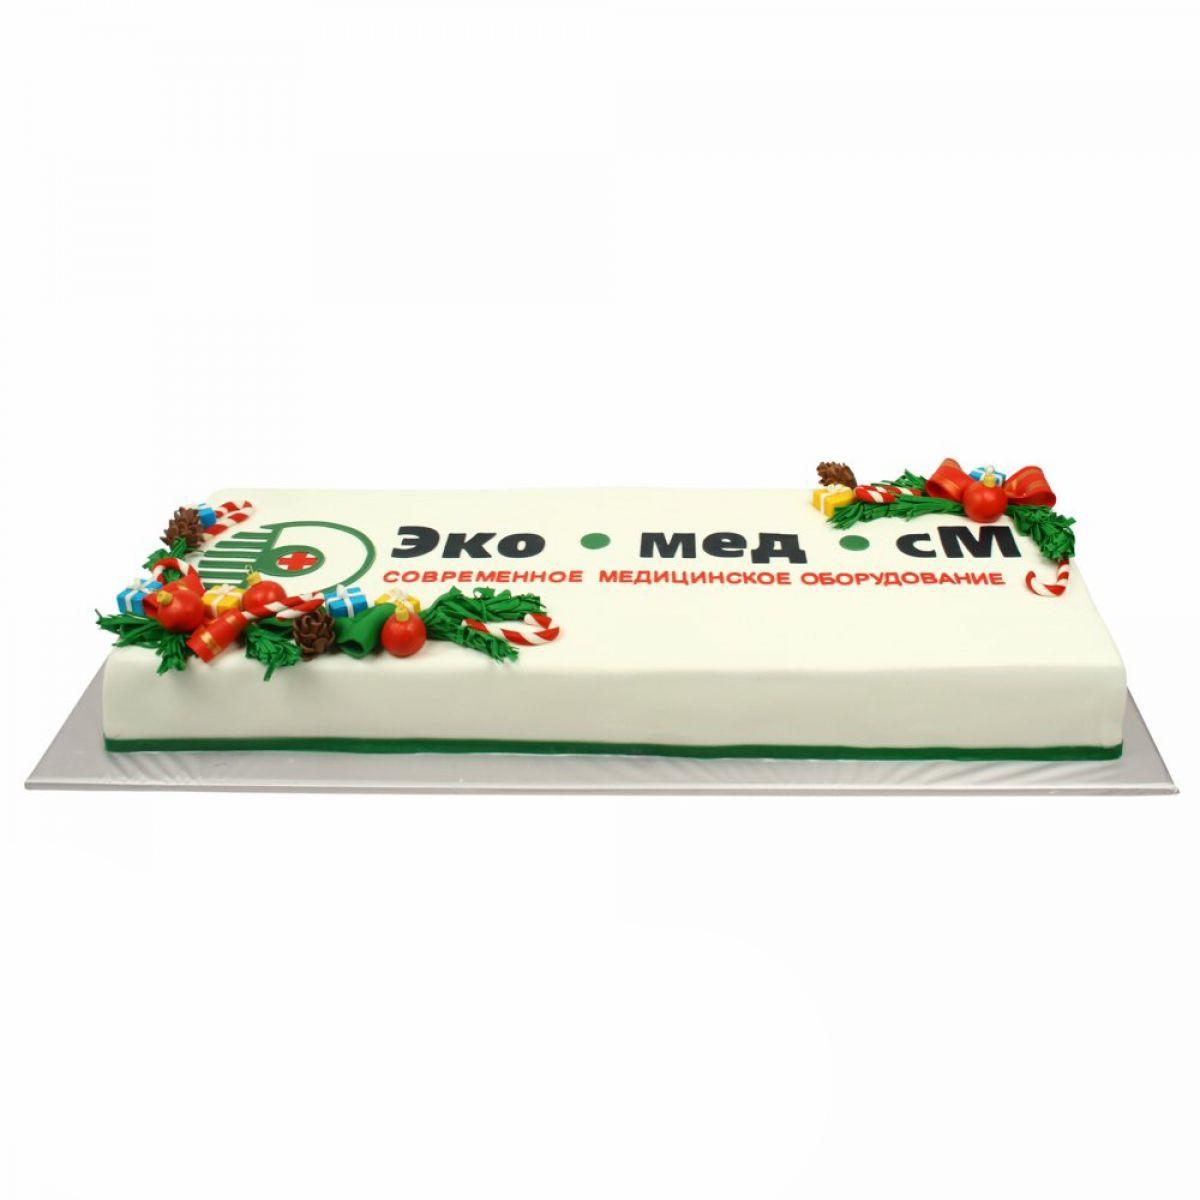 №1370 Торт врач